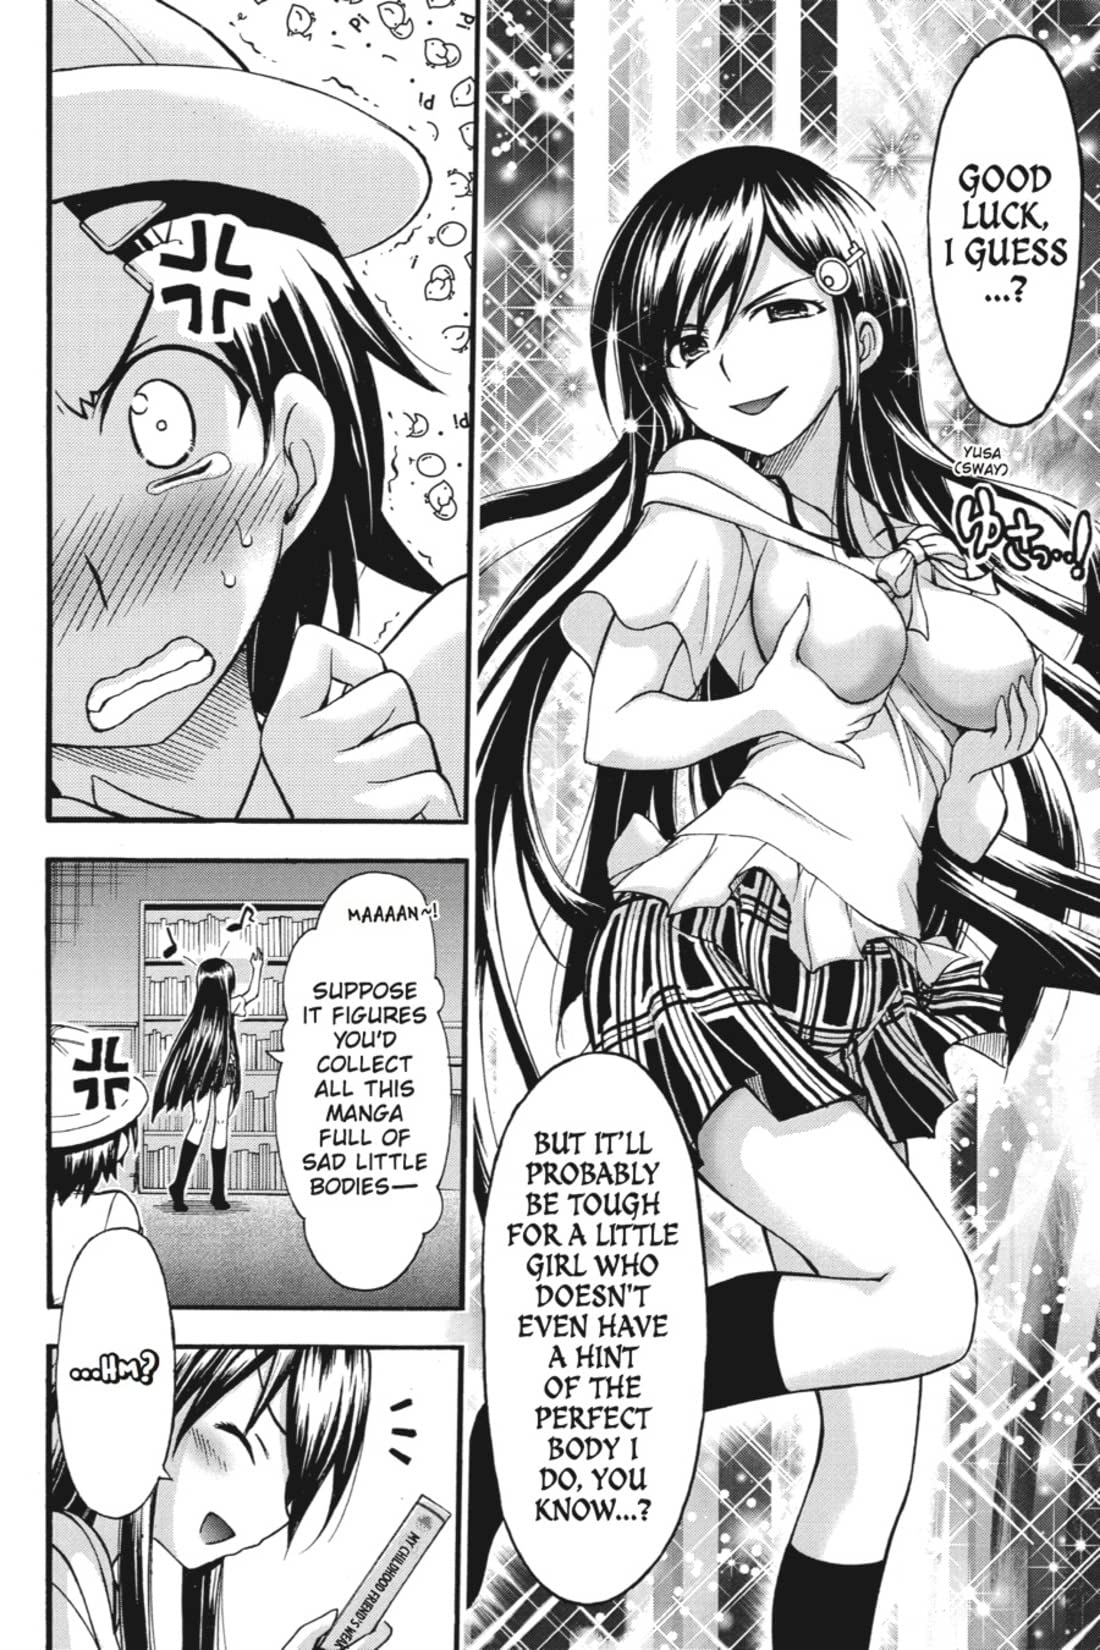 Gou-dere Sora Nagihara Vol. 3